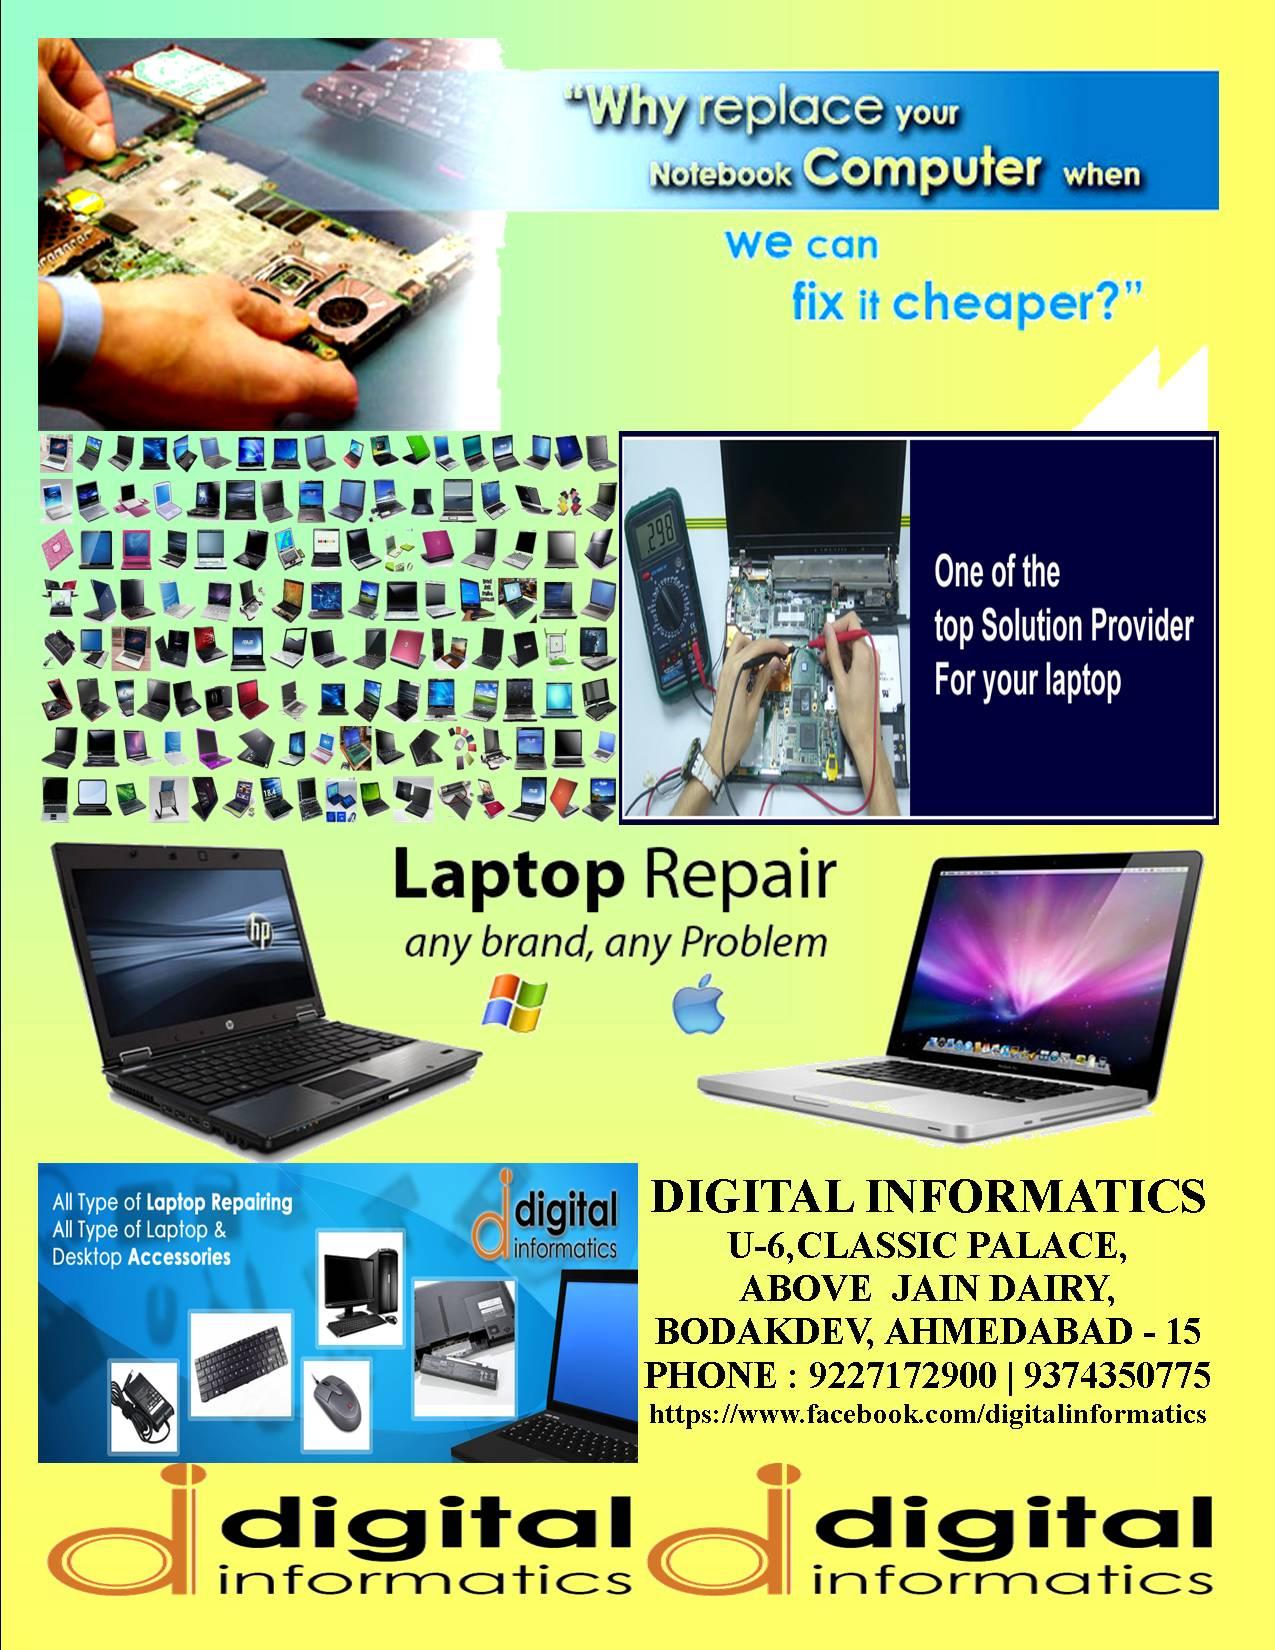 Laptop Accessories & Rapairing